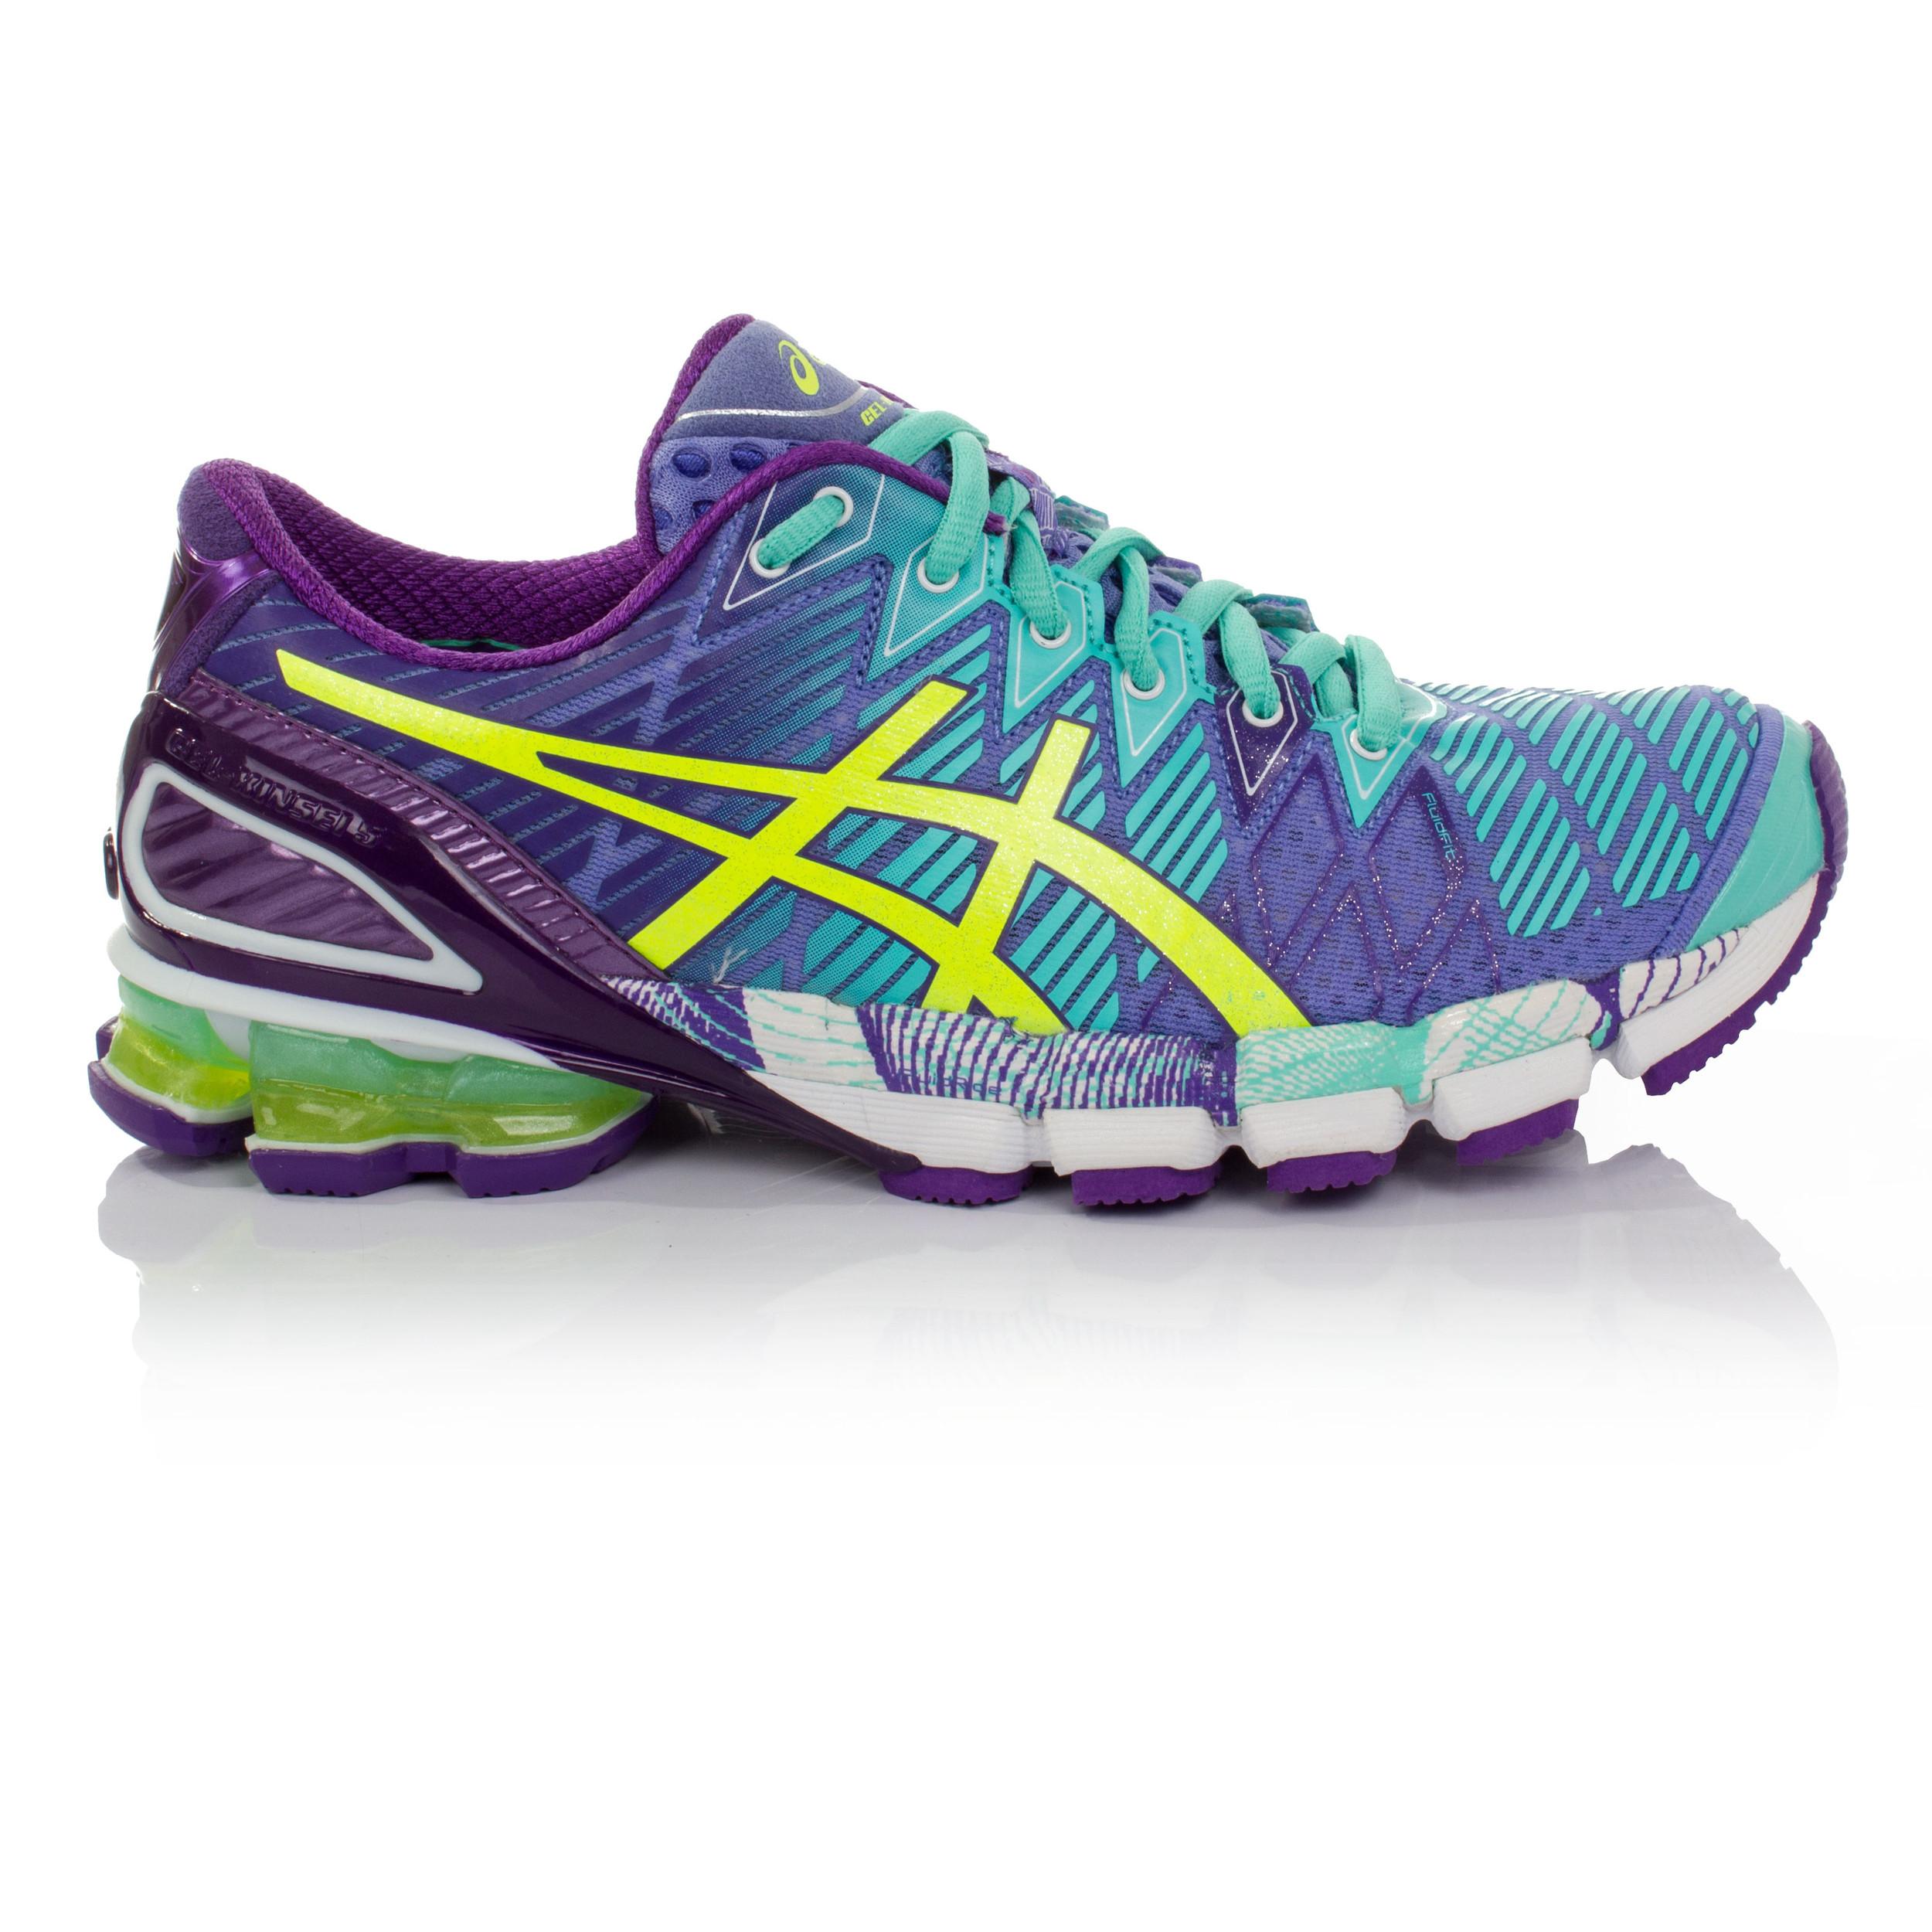 ASICS Gel Kinsei 5 da Donna Verde Viola Imbottite Corsa Scarpe da ginnastica scarpe sportive